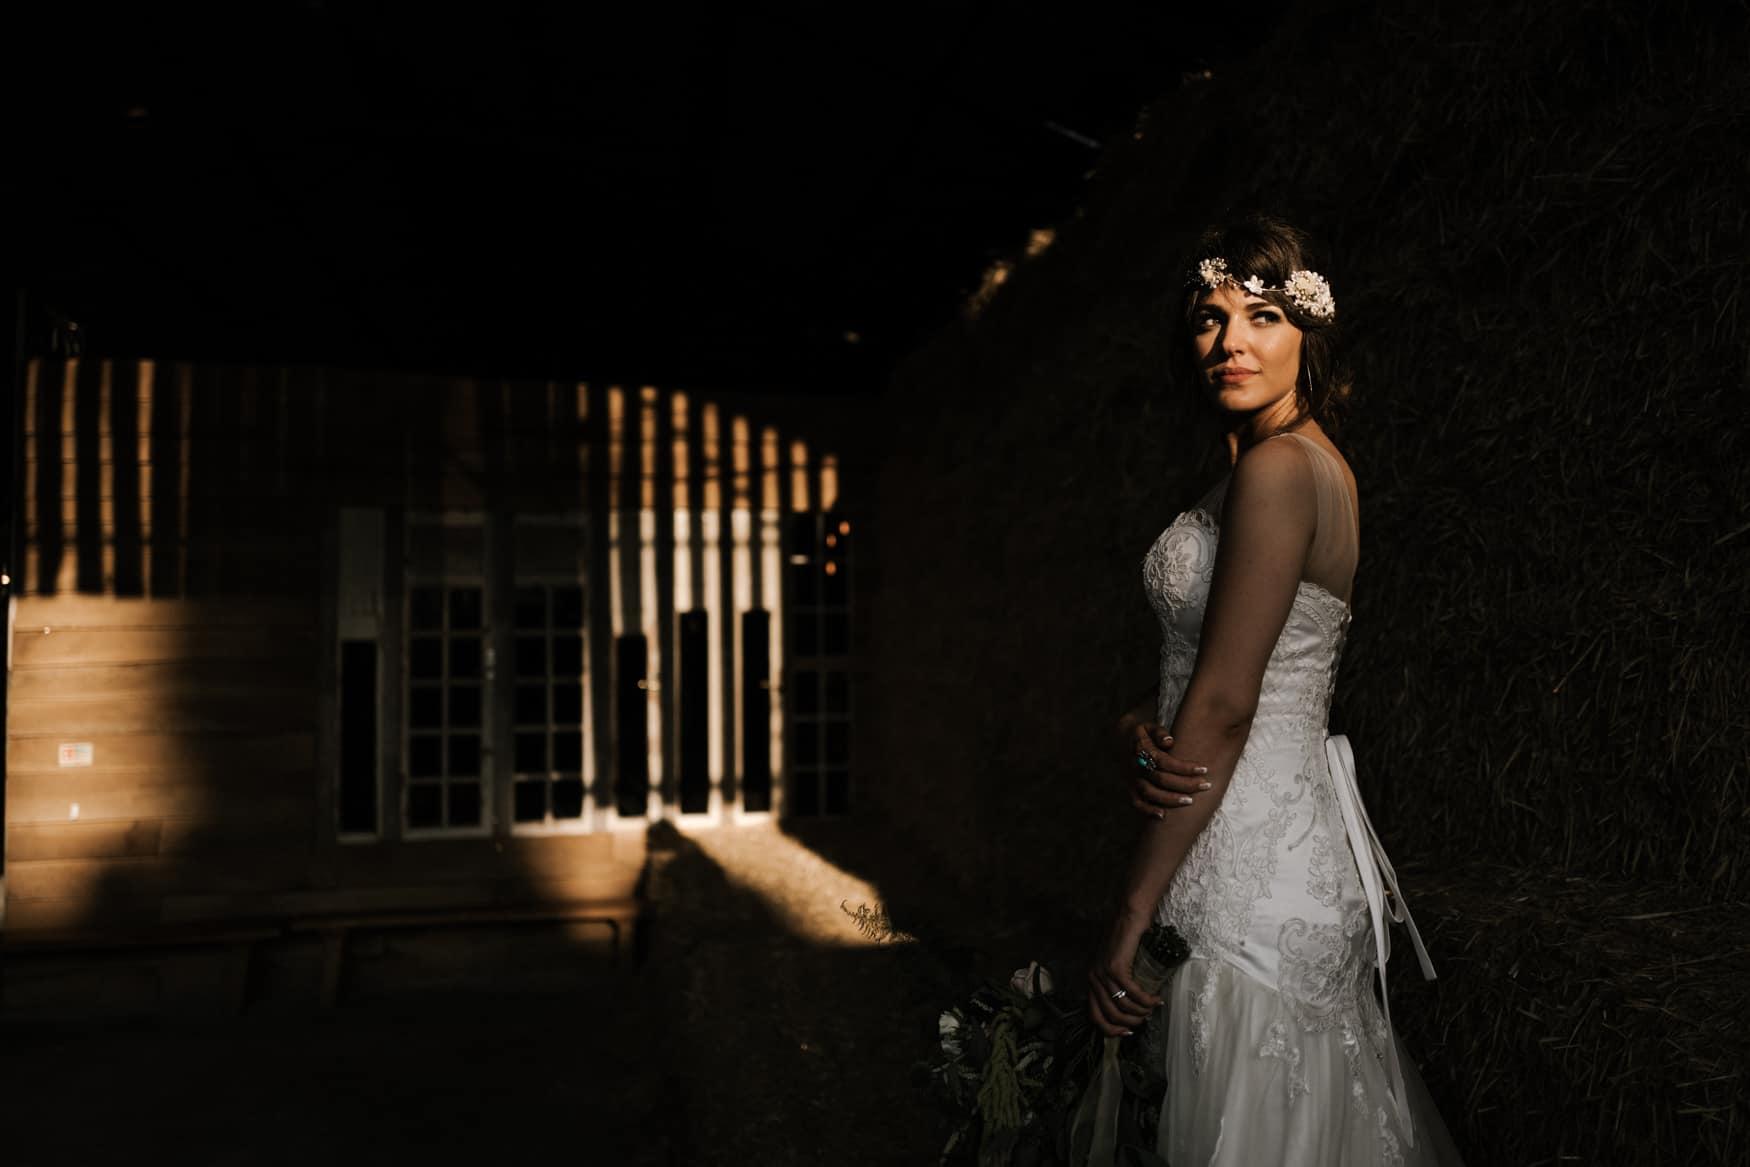 bride portrait in some beautiful golden light